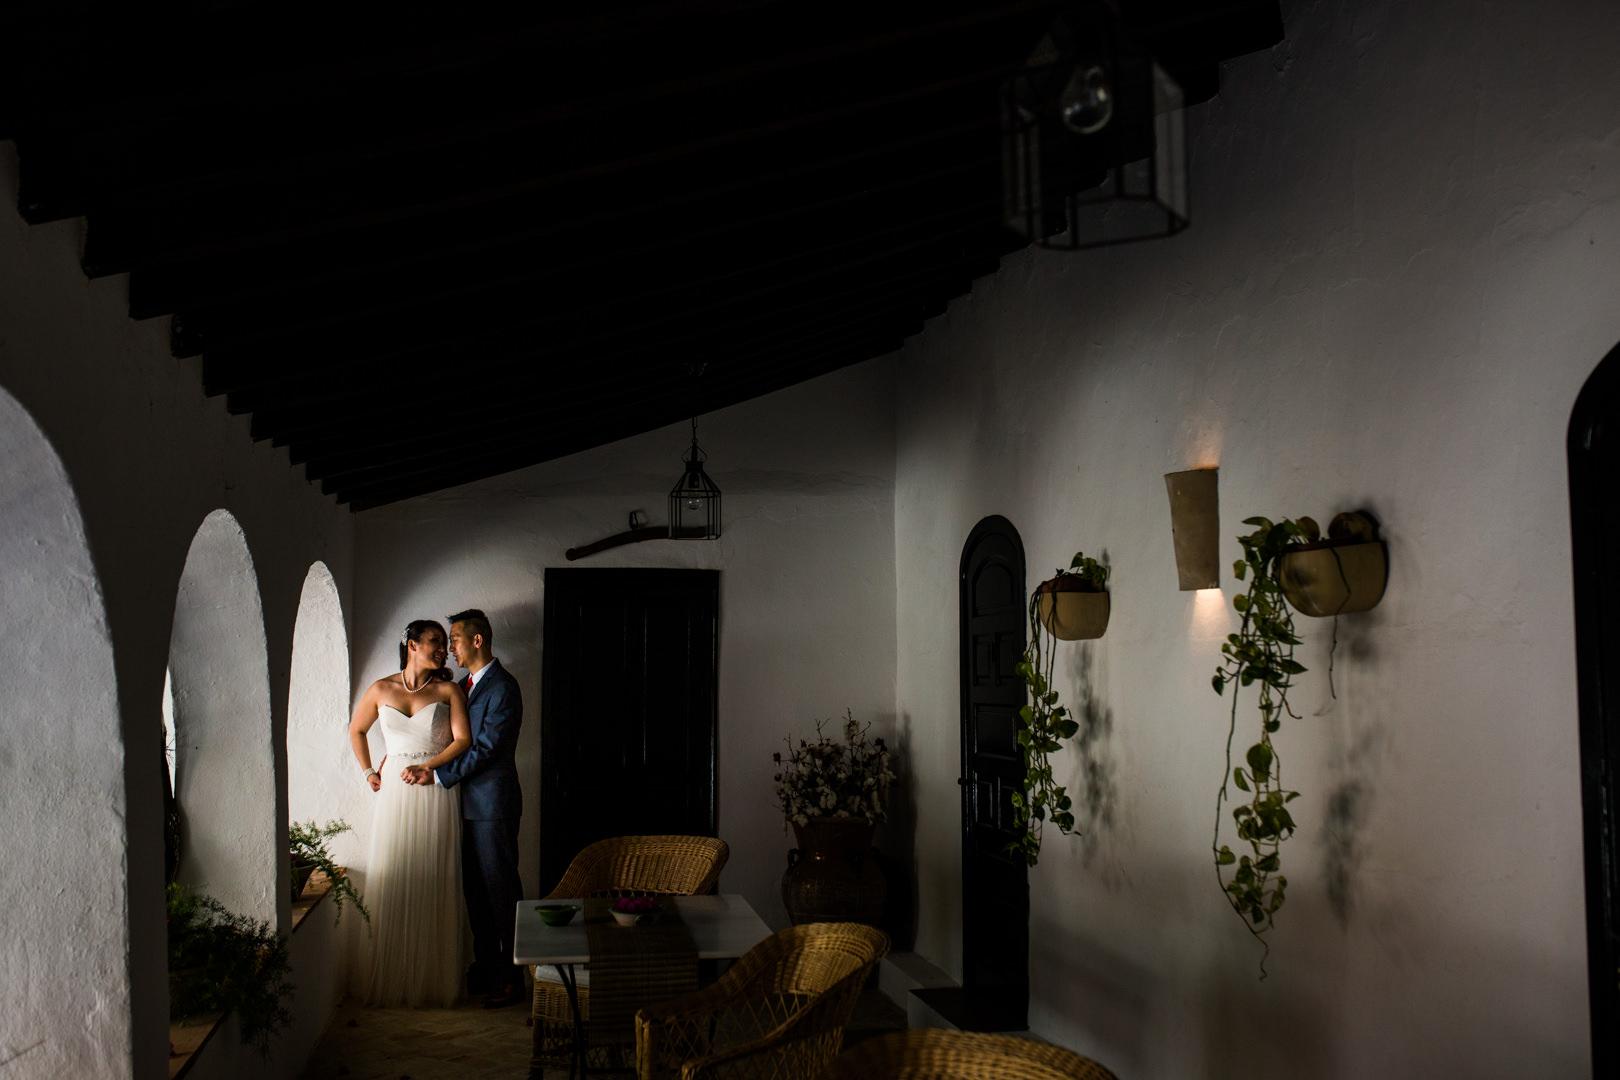 Boda-Hacienda-San-Rafael-Sevilla-engagement-Rafael-Torres-fotografo-bodas-sevilla-madrid-barcelona-wedding-photographer--44.jpg